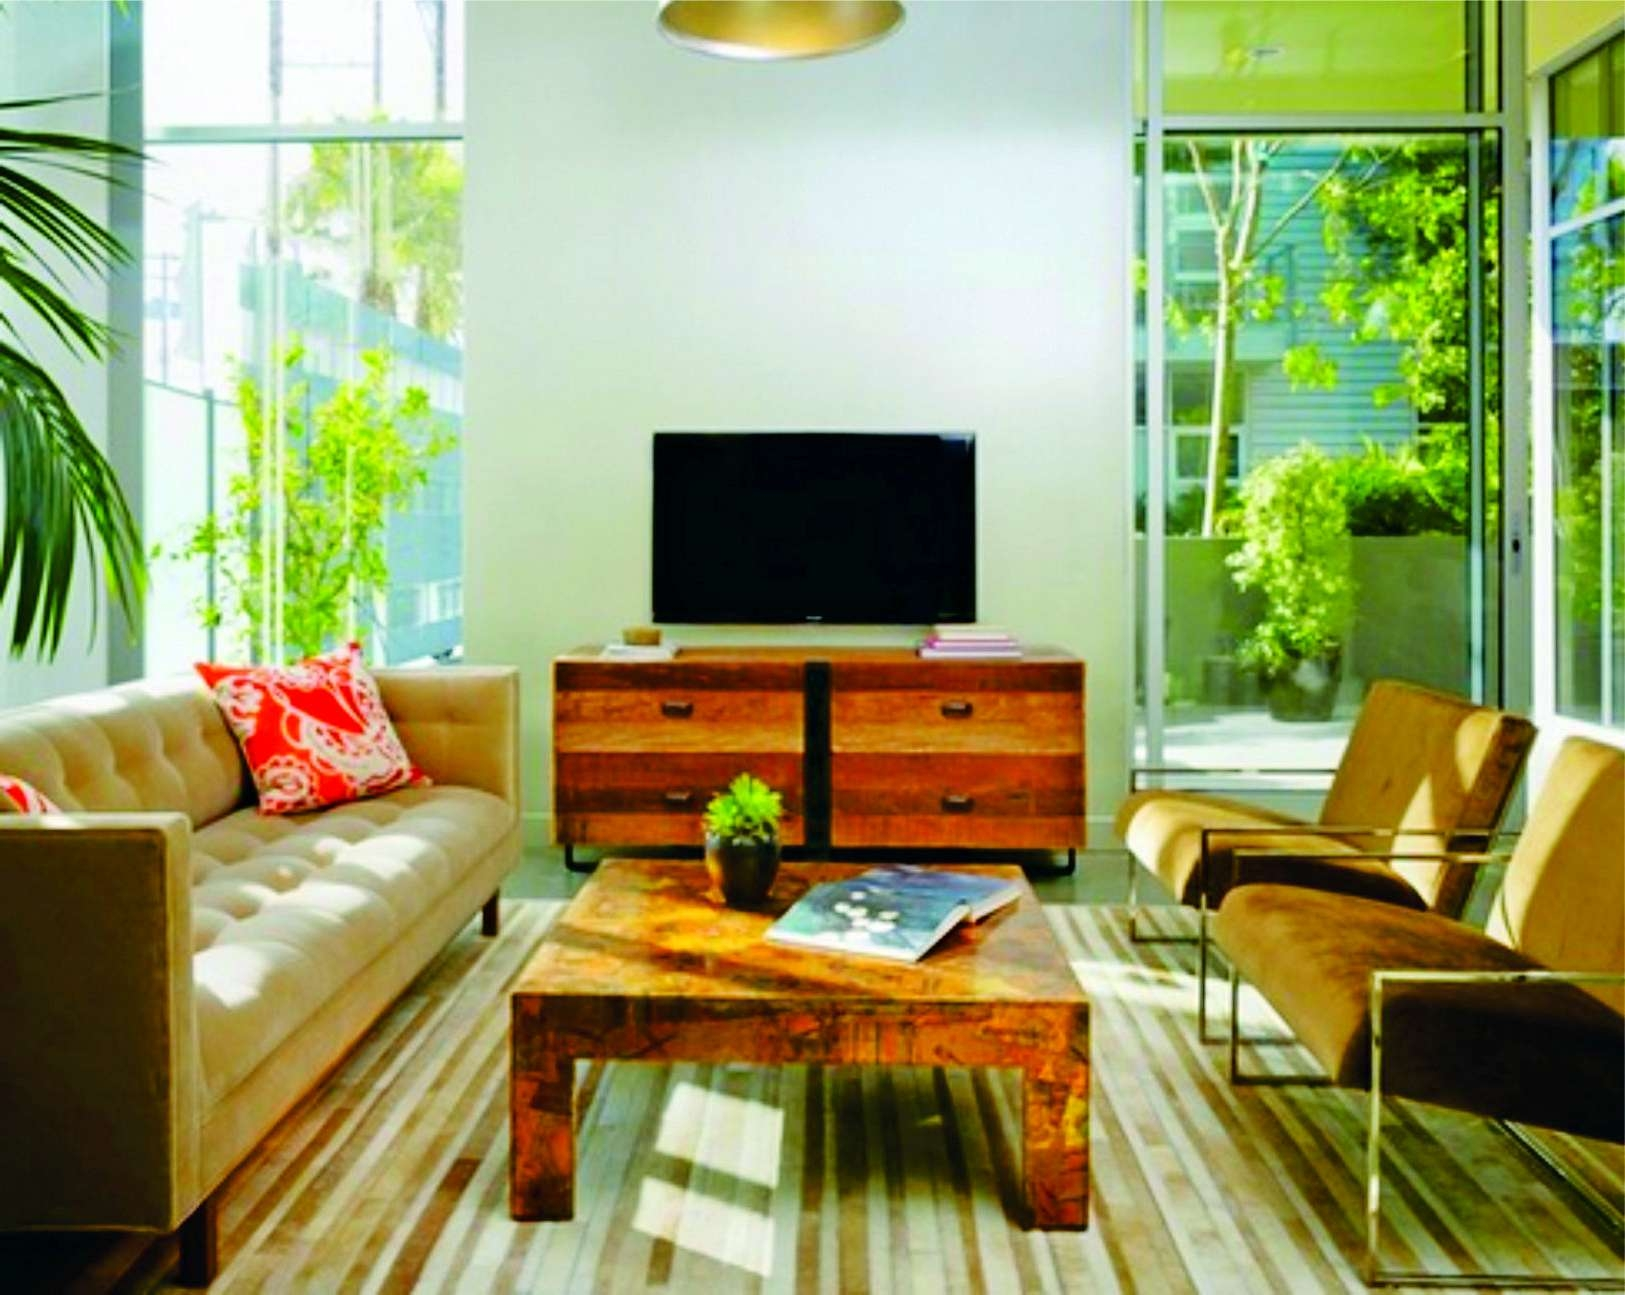 Tv : Playroom Tv Stands Extraordinary Playroom Tv Stands Intended For Playroom Tv Stands (View 14 of 20)